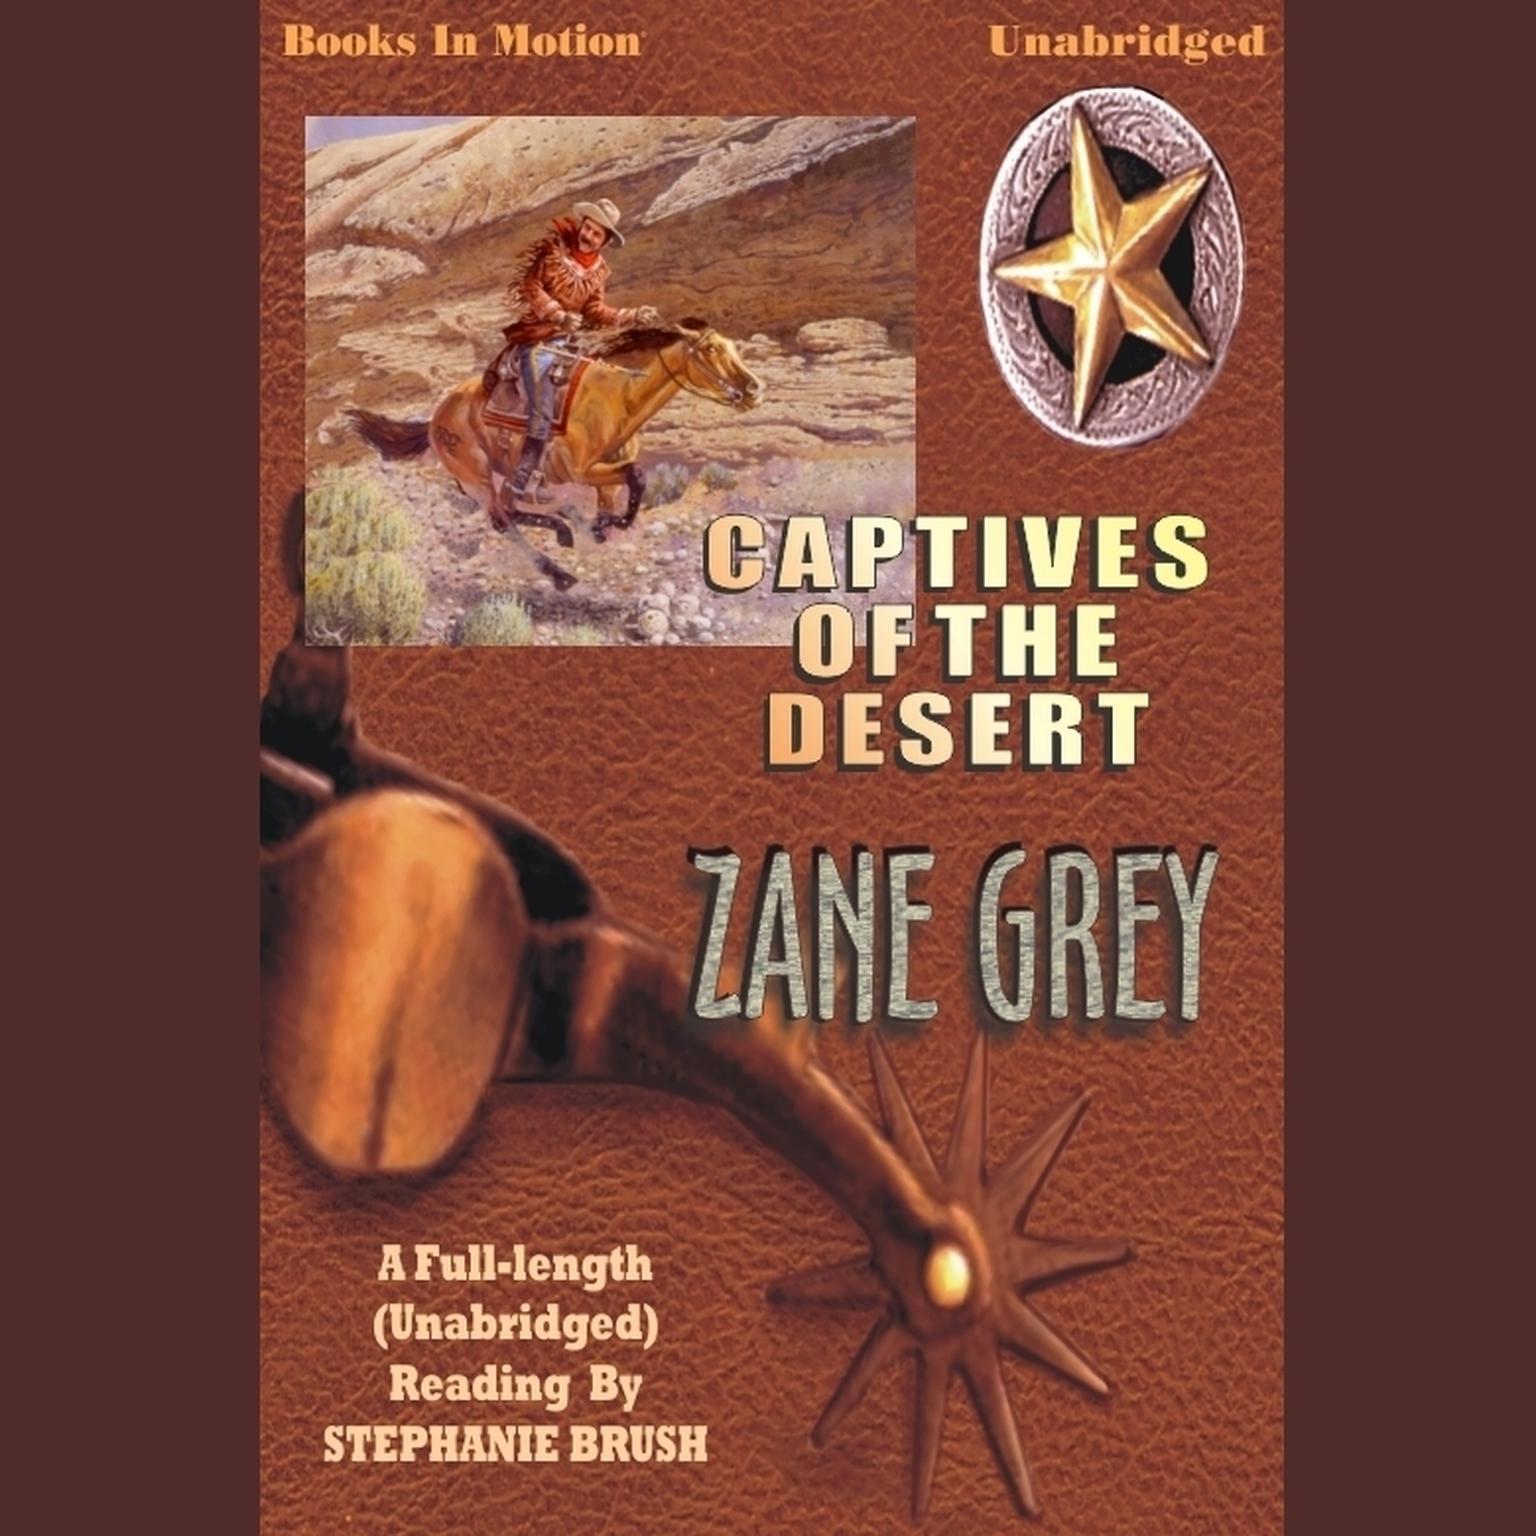 Captives of the Desert Audiobook, by Zane Grey